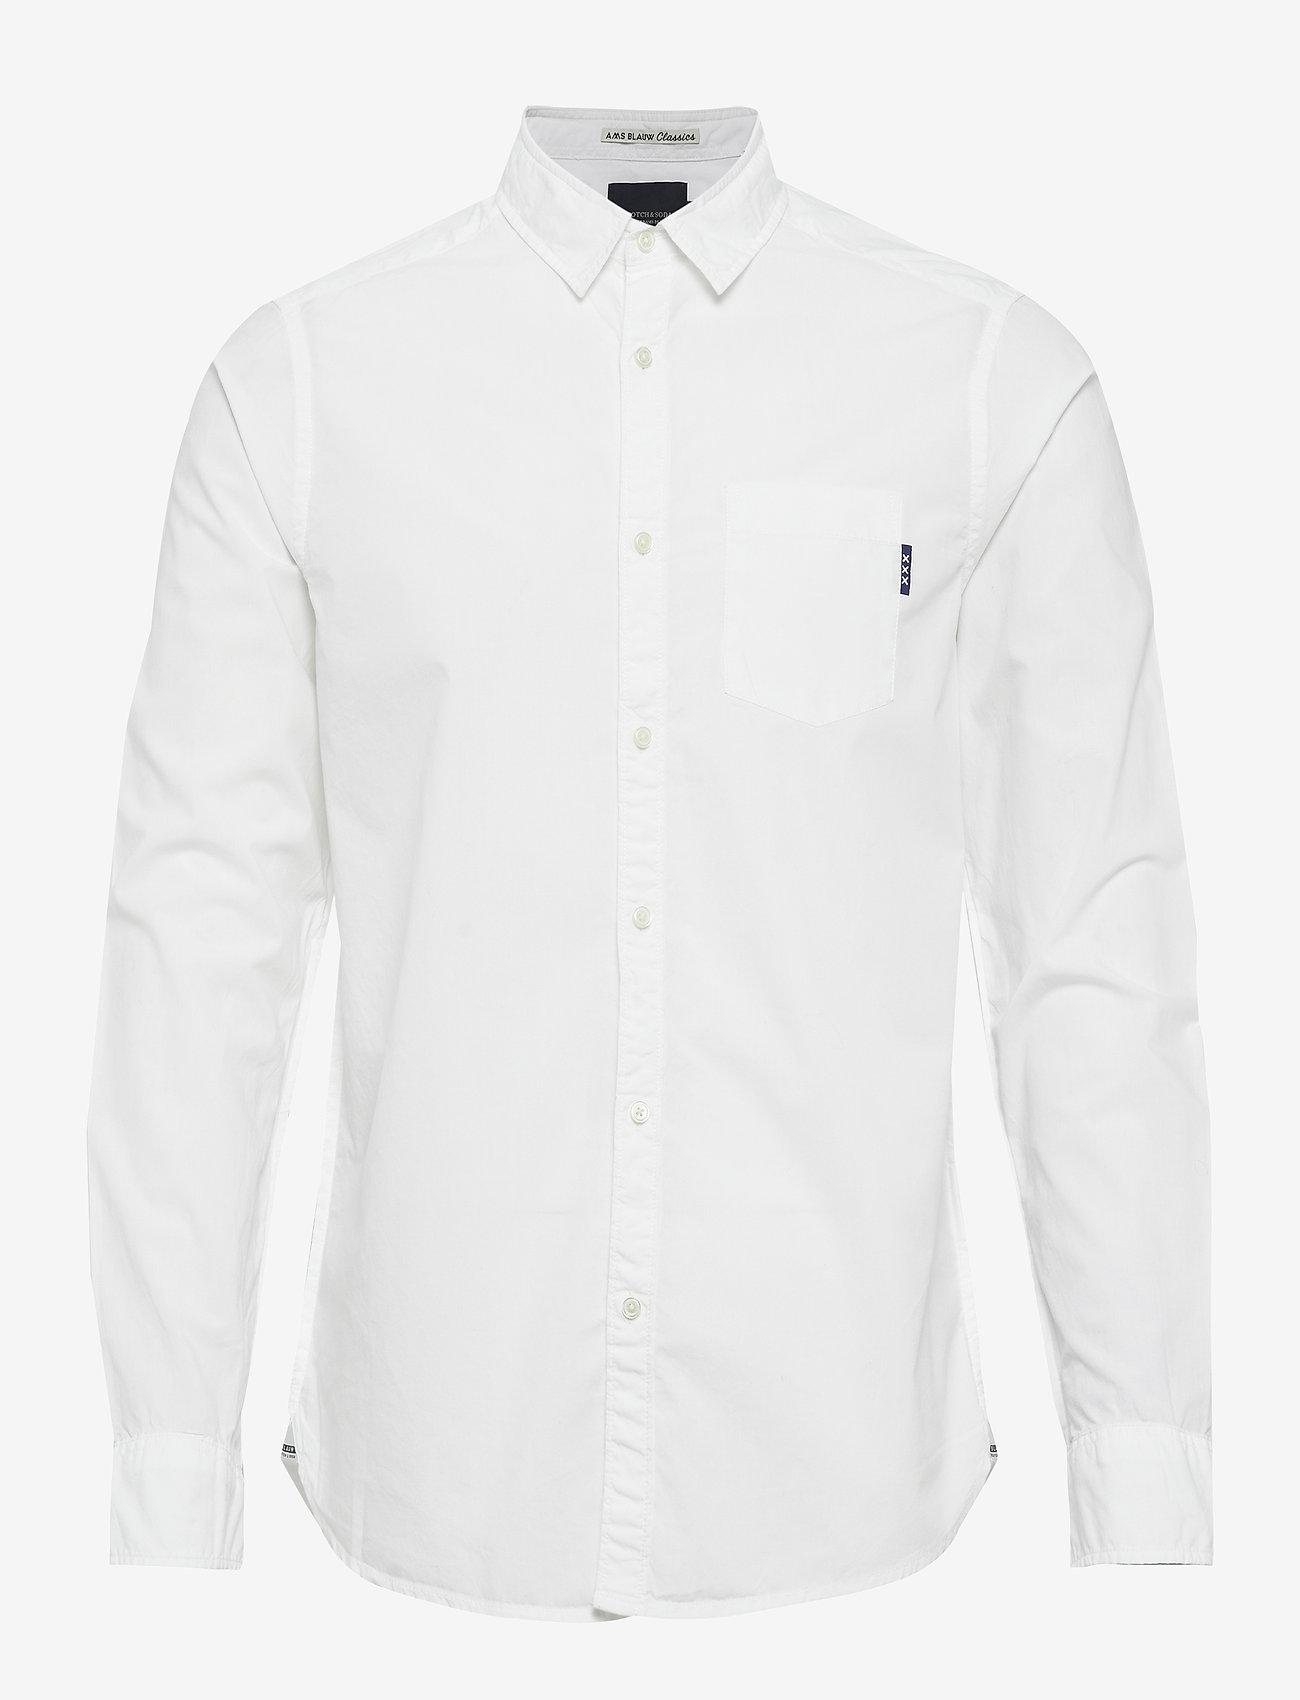 Scotch & Soda - Ams Blauw light weight shirt - basic shirts - off white - 0